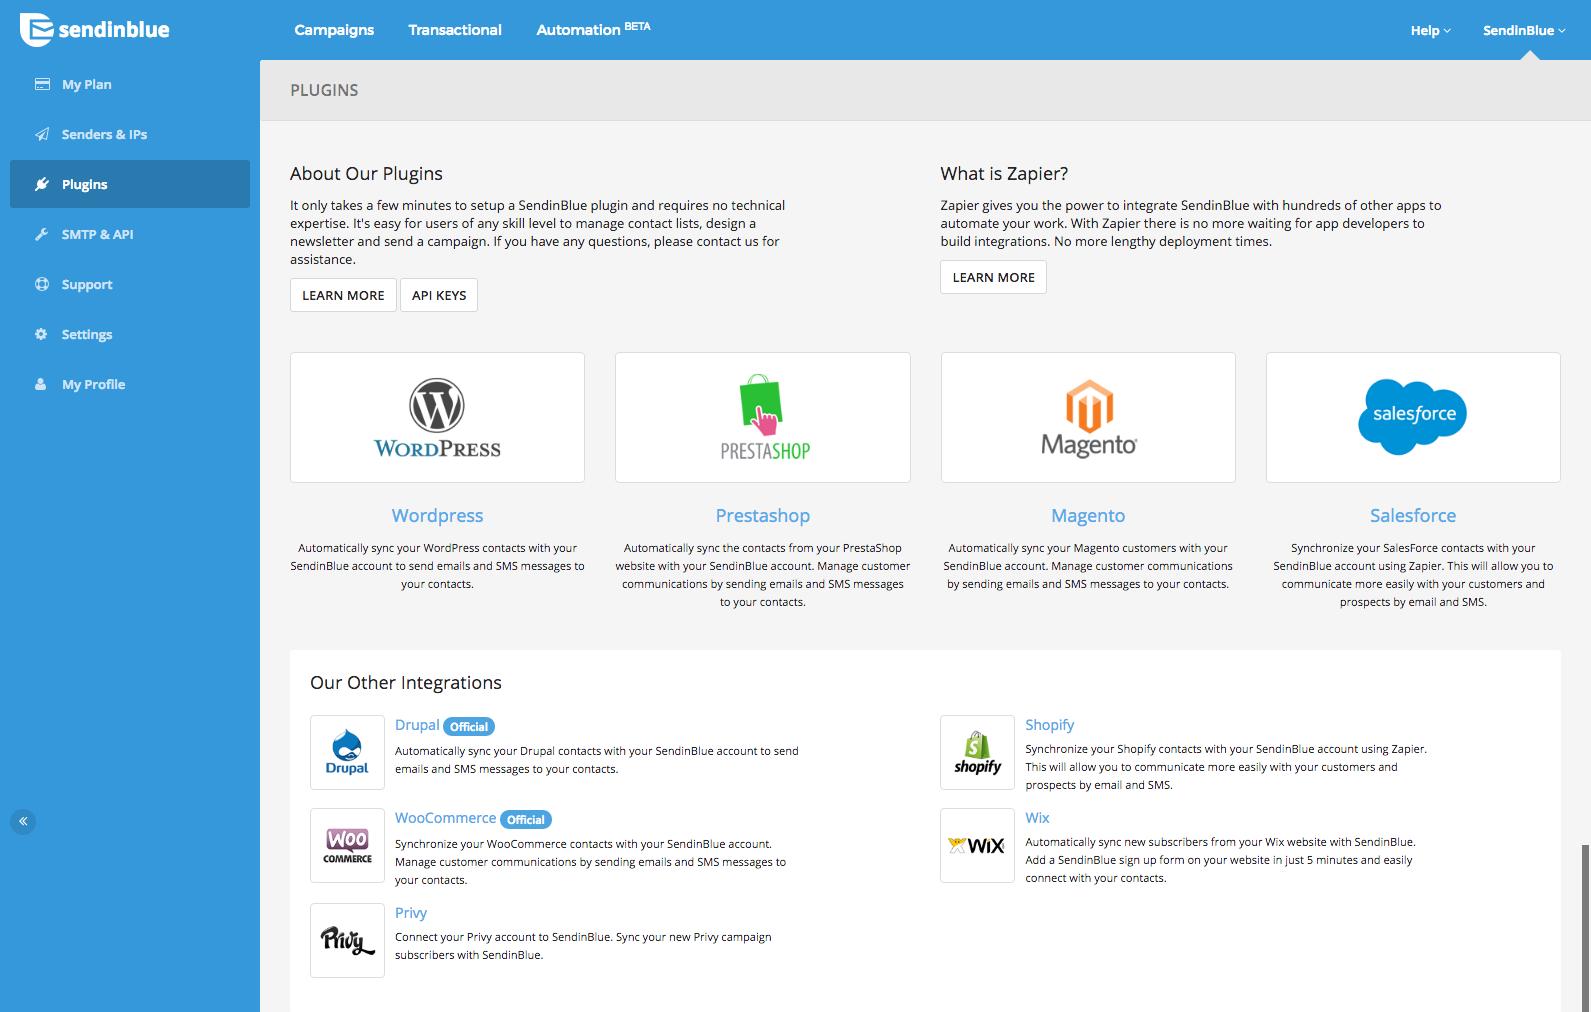 Sendinblue Software - Integrations